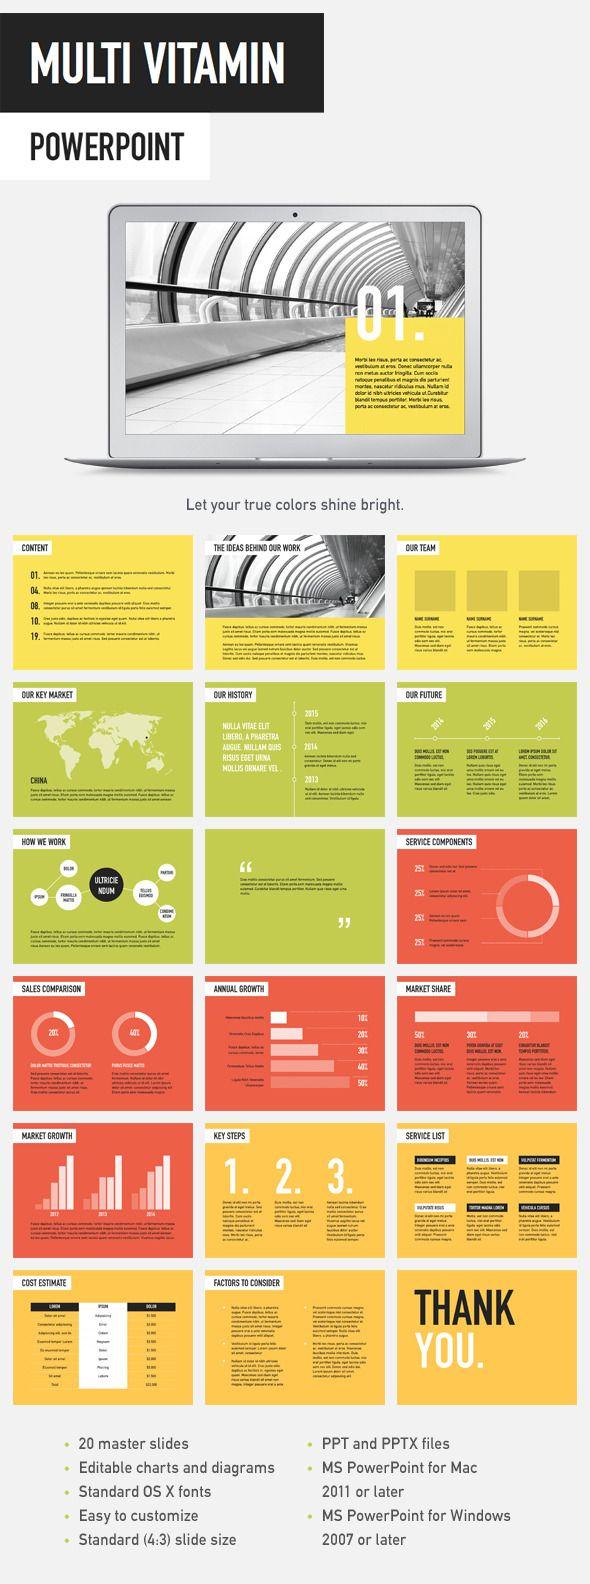 multi vitamin powerpoint template | presentation templates, Powerpoint templates